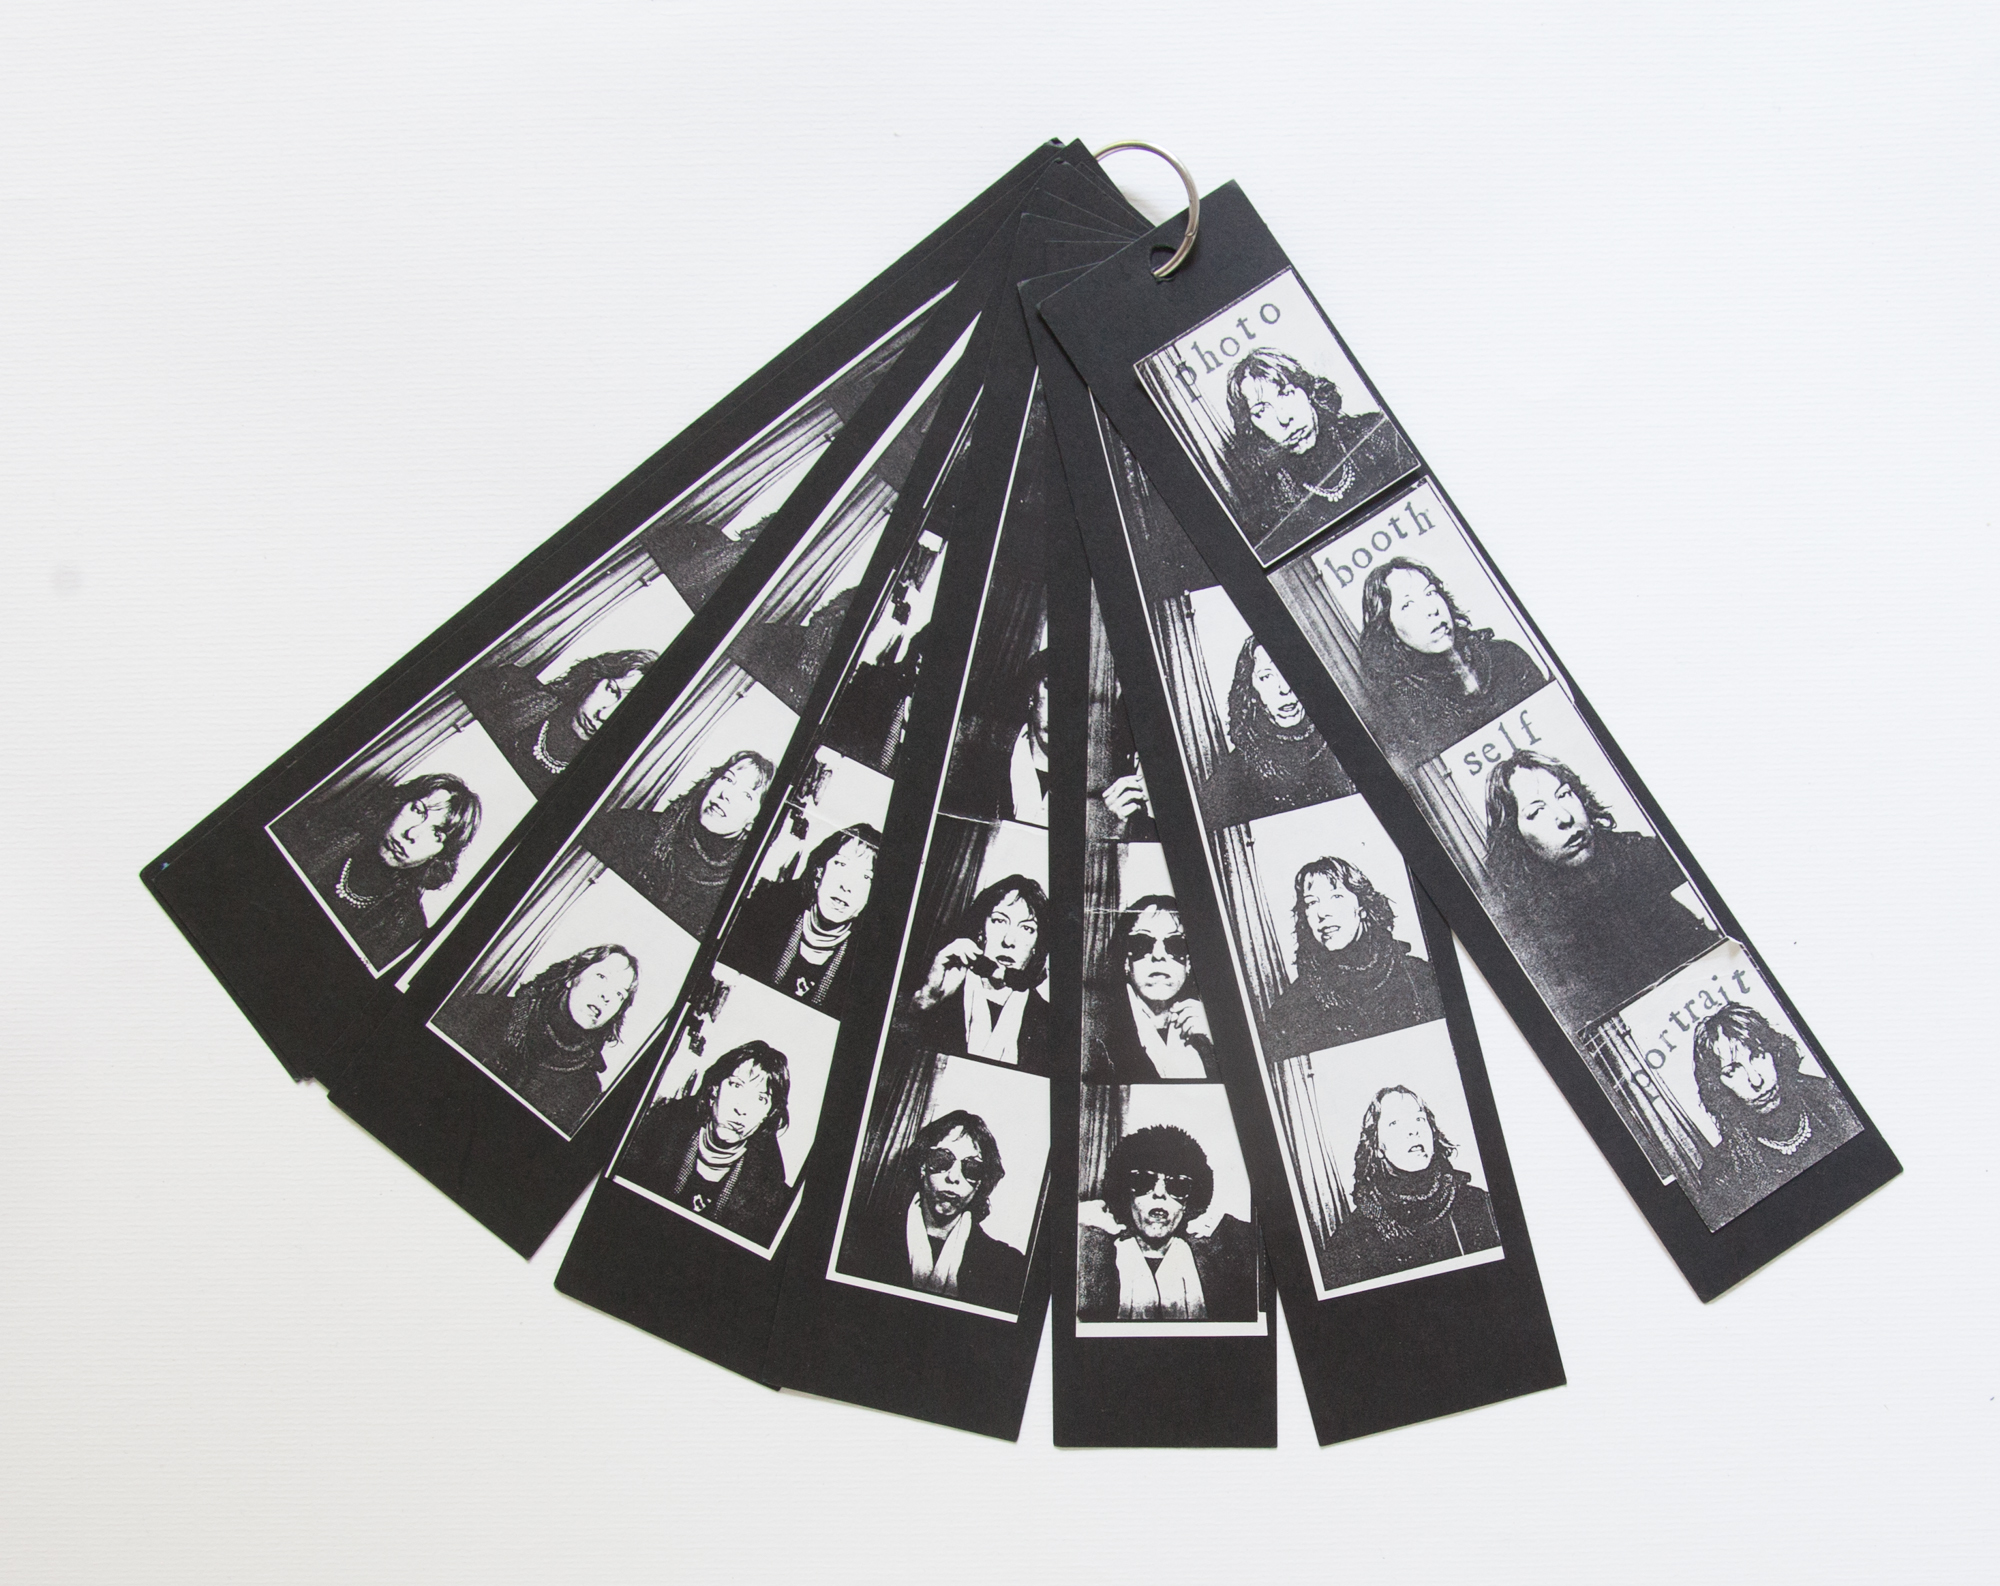 189_Photo Booth Self-Portraits (1988)_.jpg